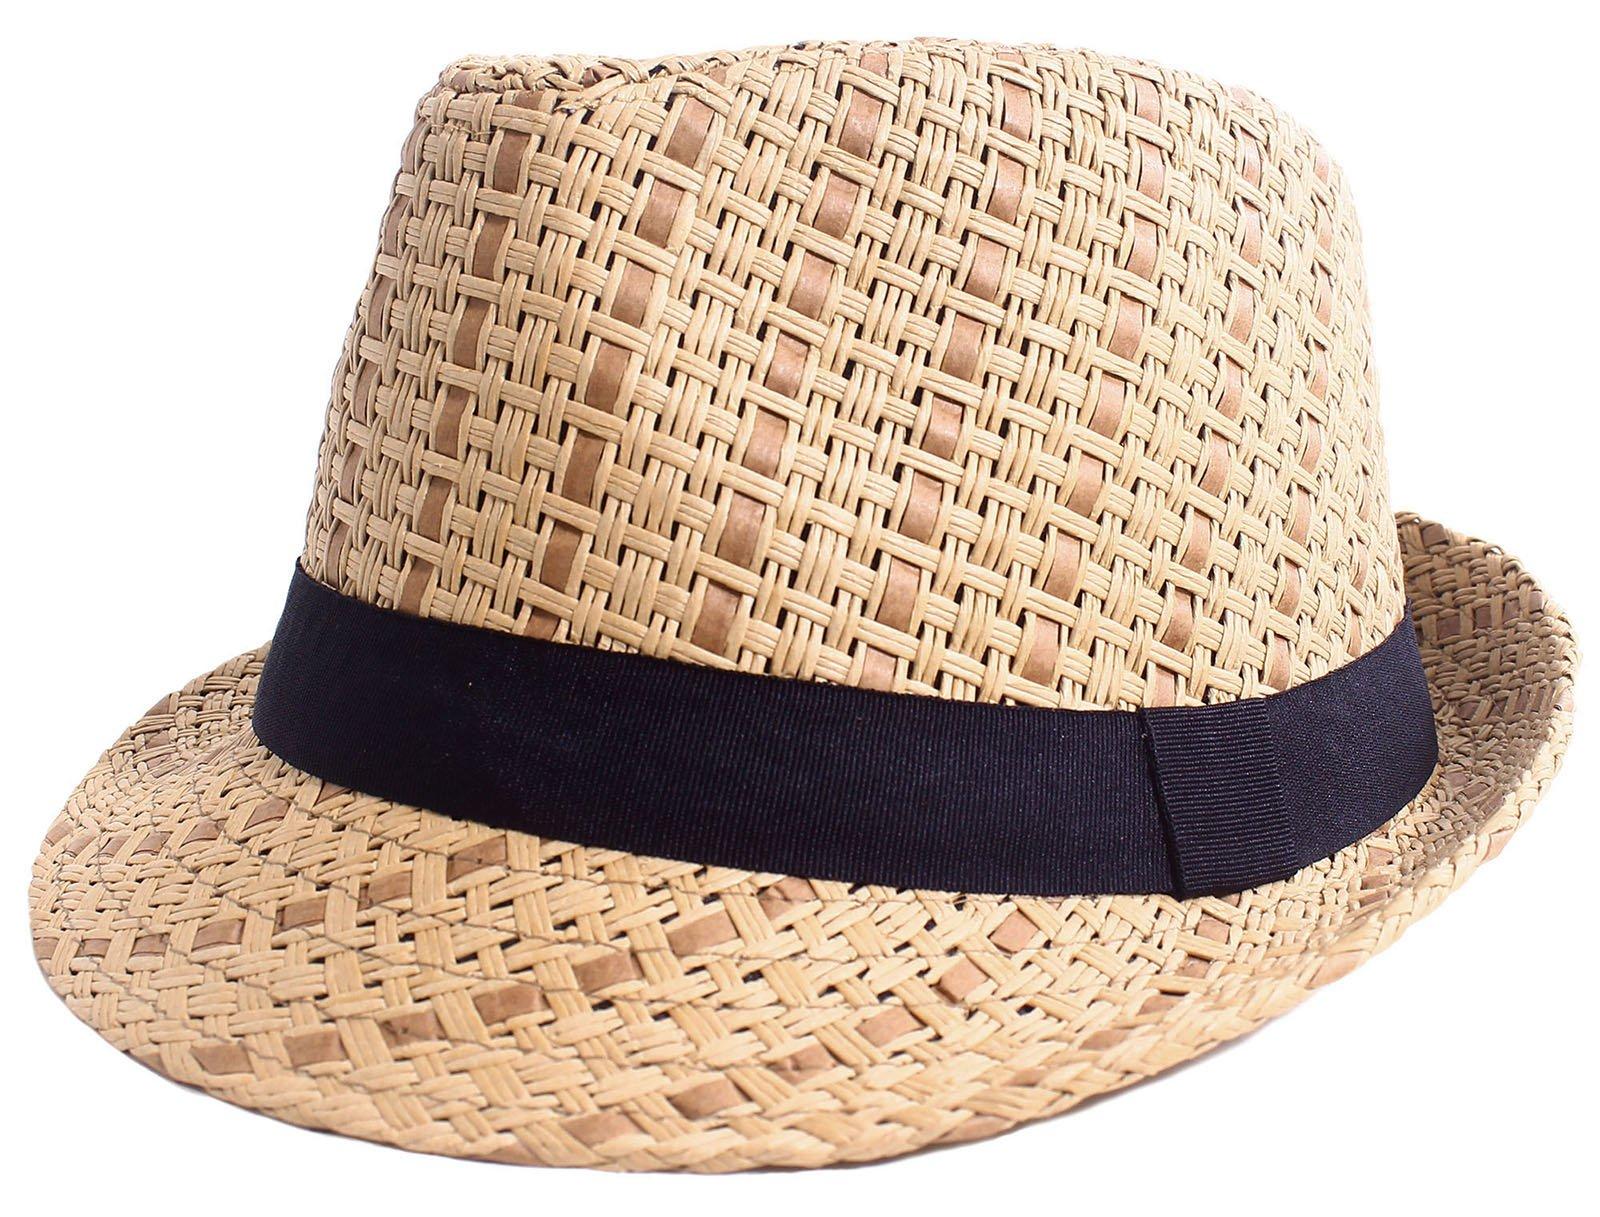 Straw Fedora Hat Men / Women's Summer Short Brim Cap with Black Band, Brown S/M